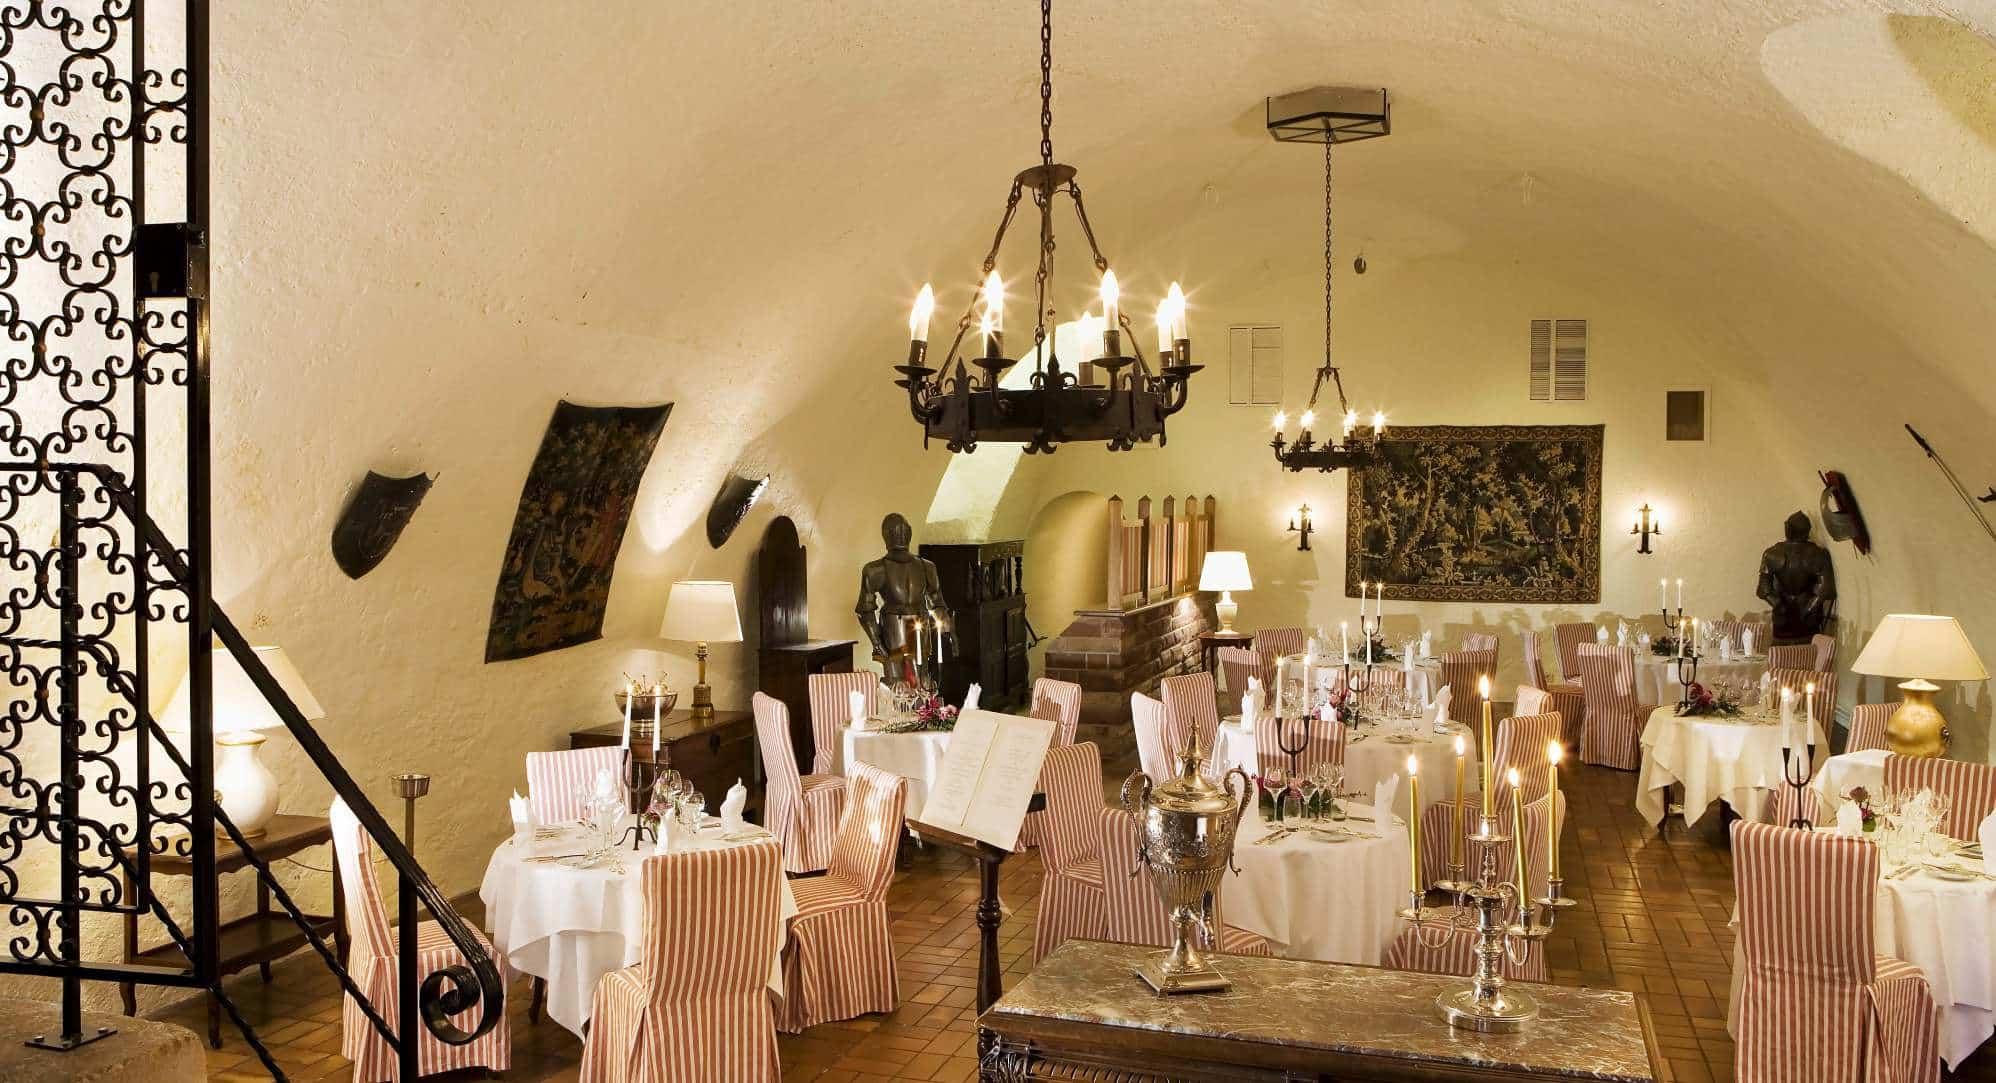 Diner concert en Alsace - Rouffach